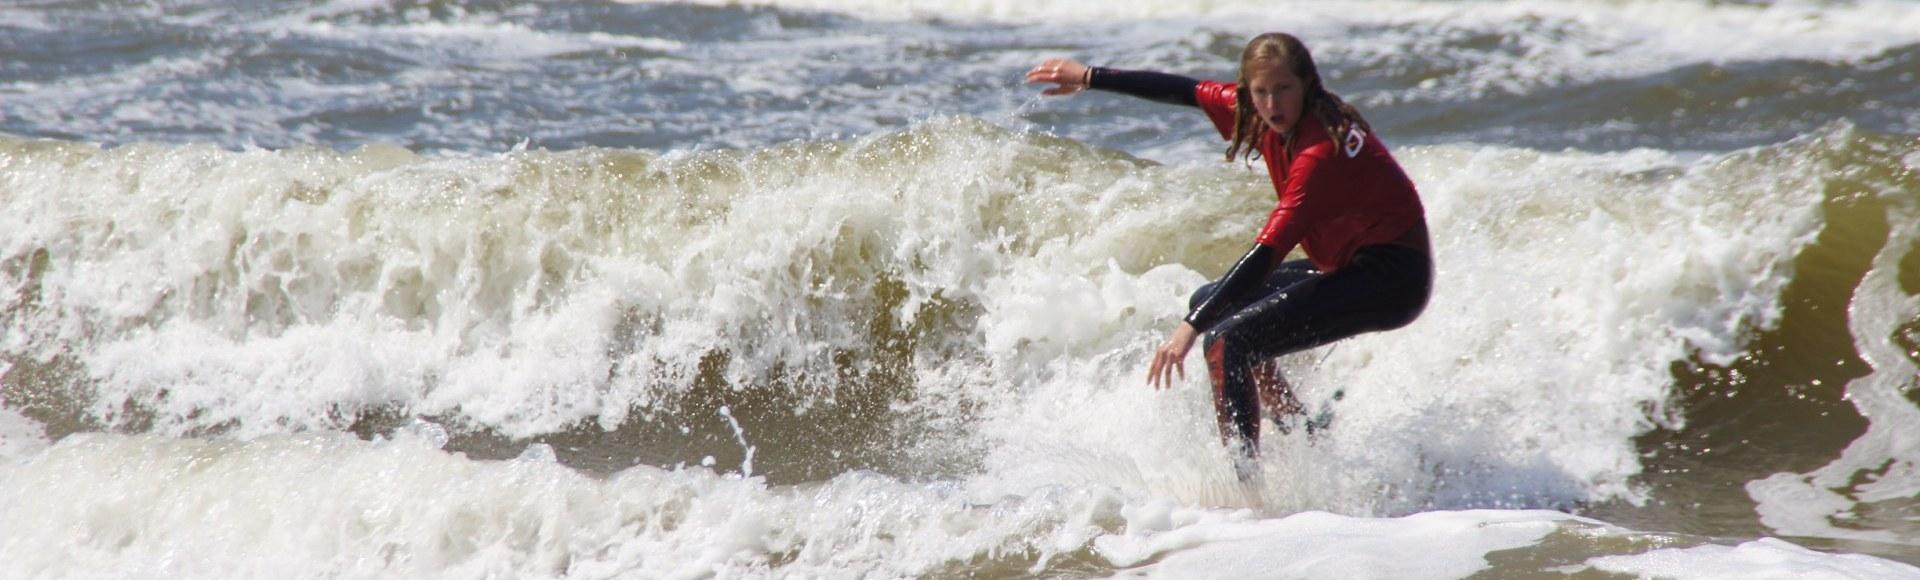 Surfplank stalling